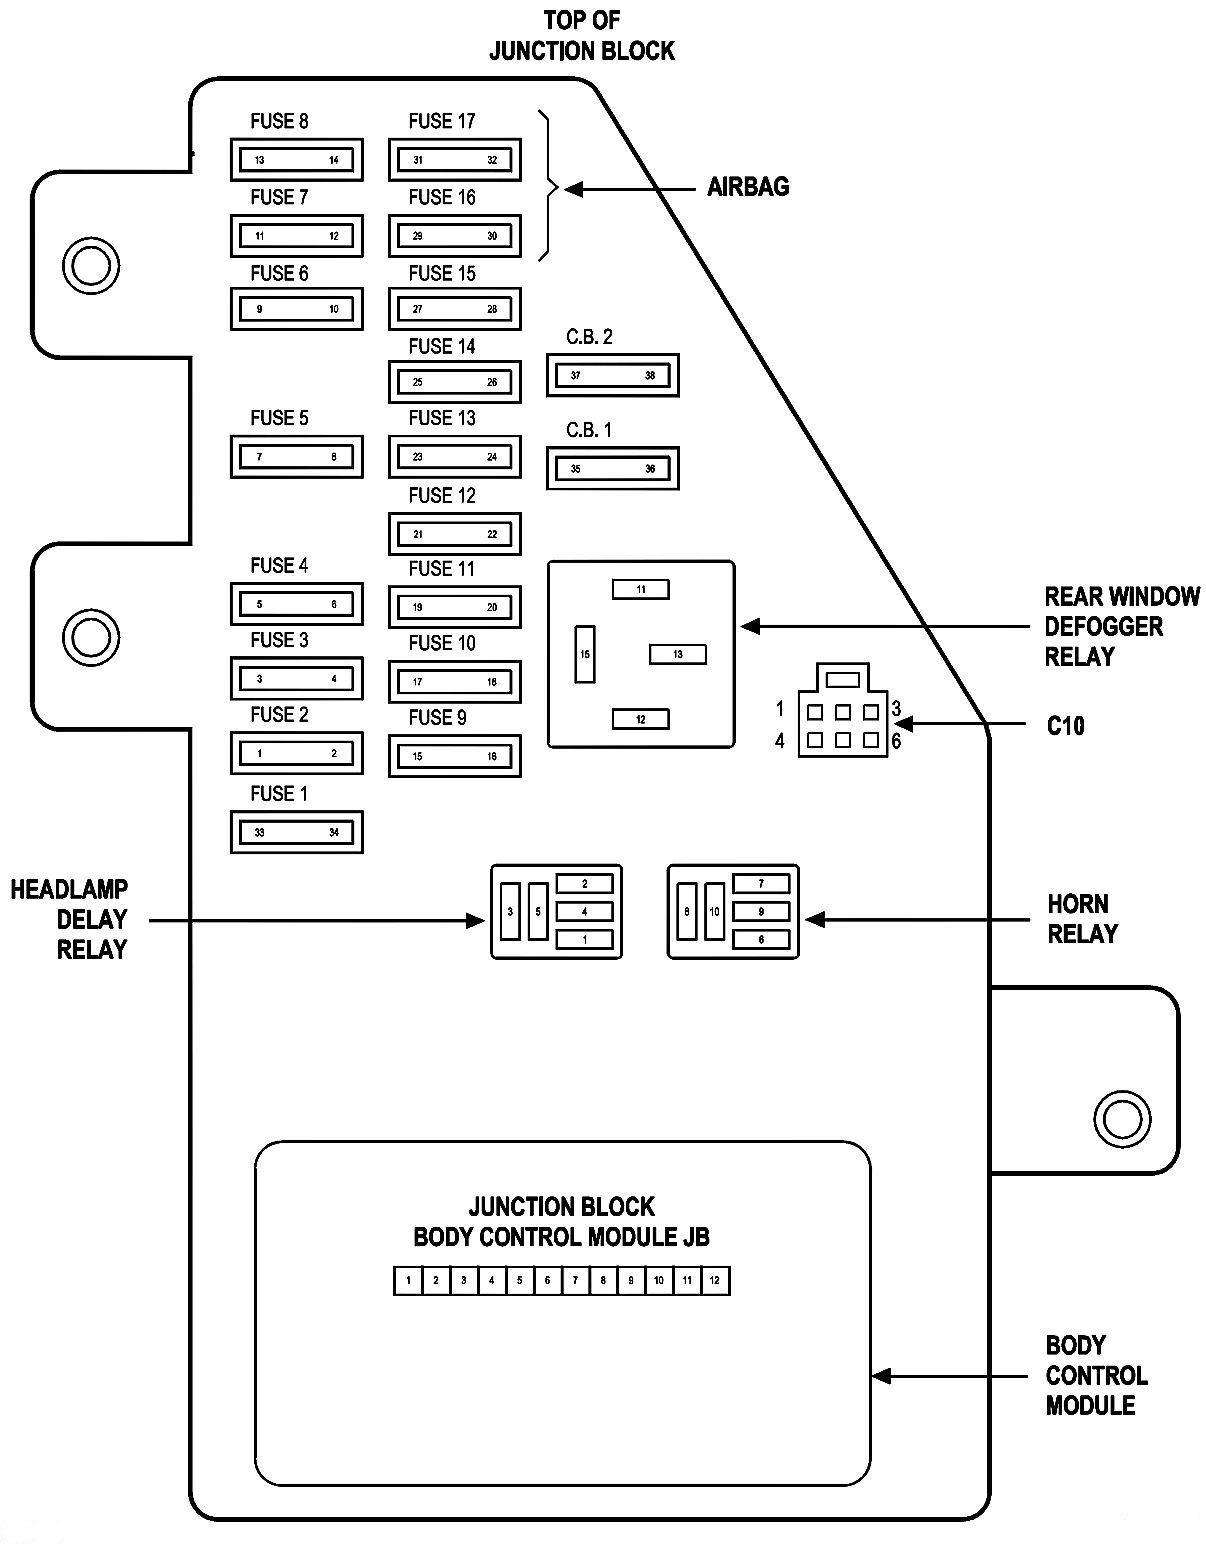 Diagram Chrysler Sebring 2008 Wiring Diagram Full Version Hd Quality Wiring Diagram 123843 Wiringpro Vincentescrive Fr